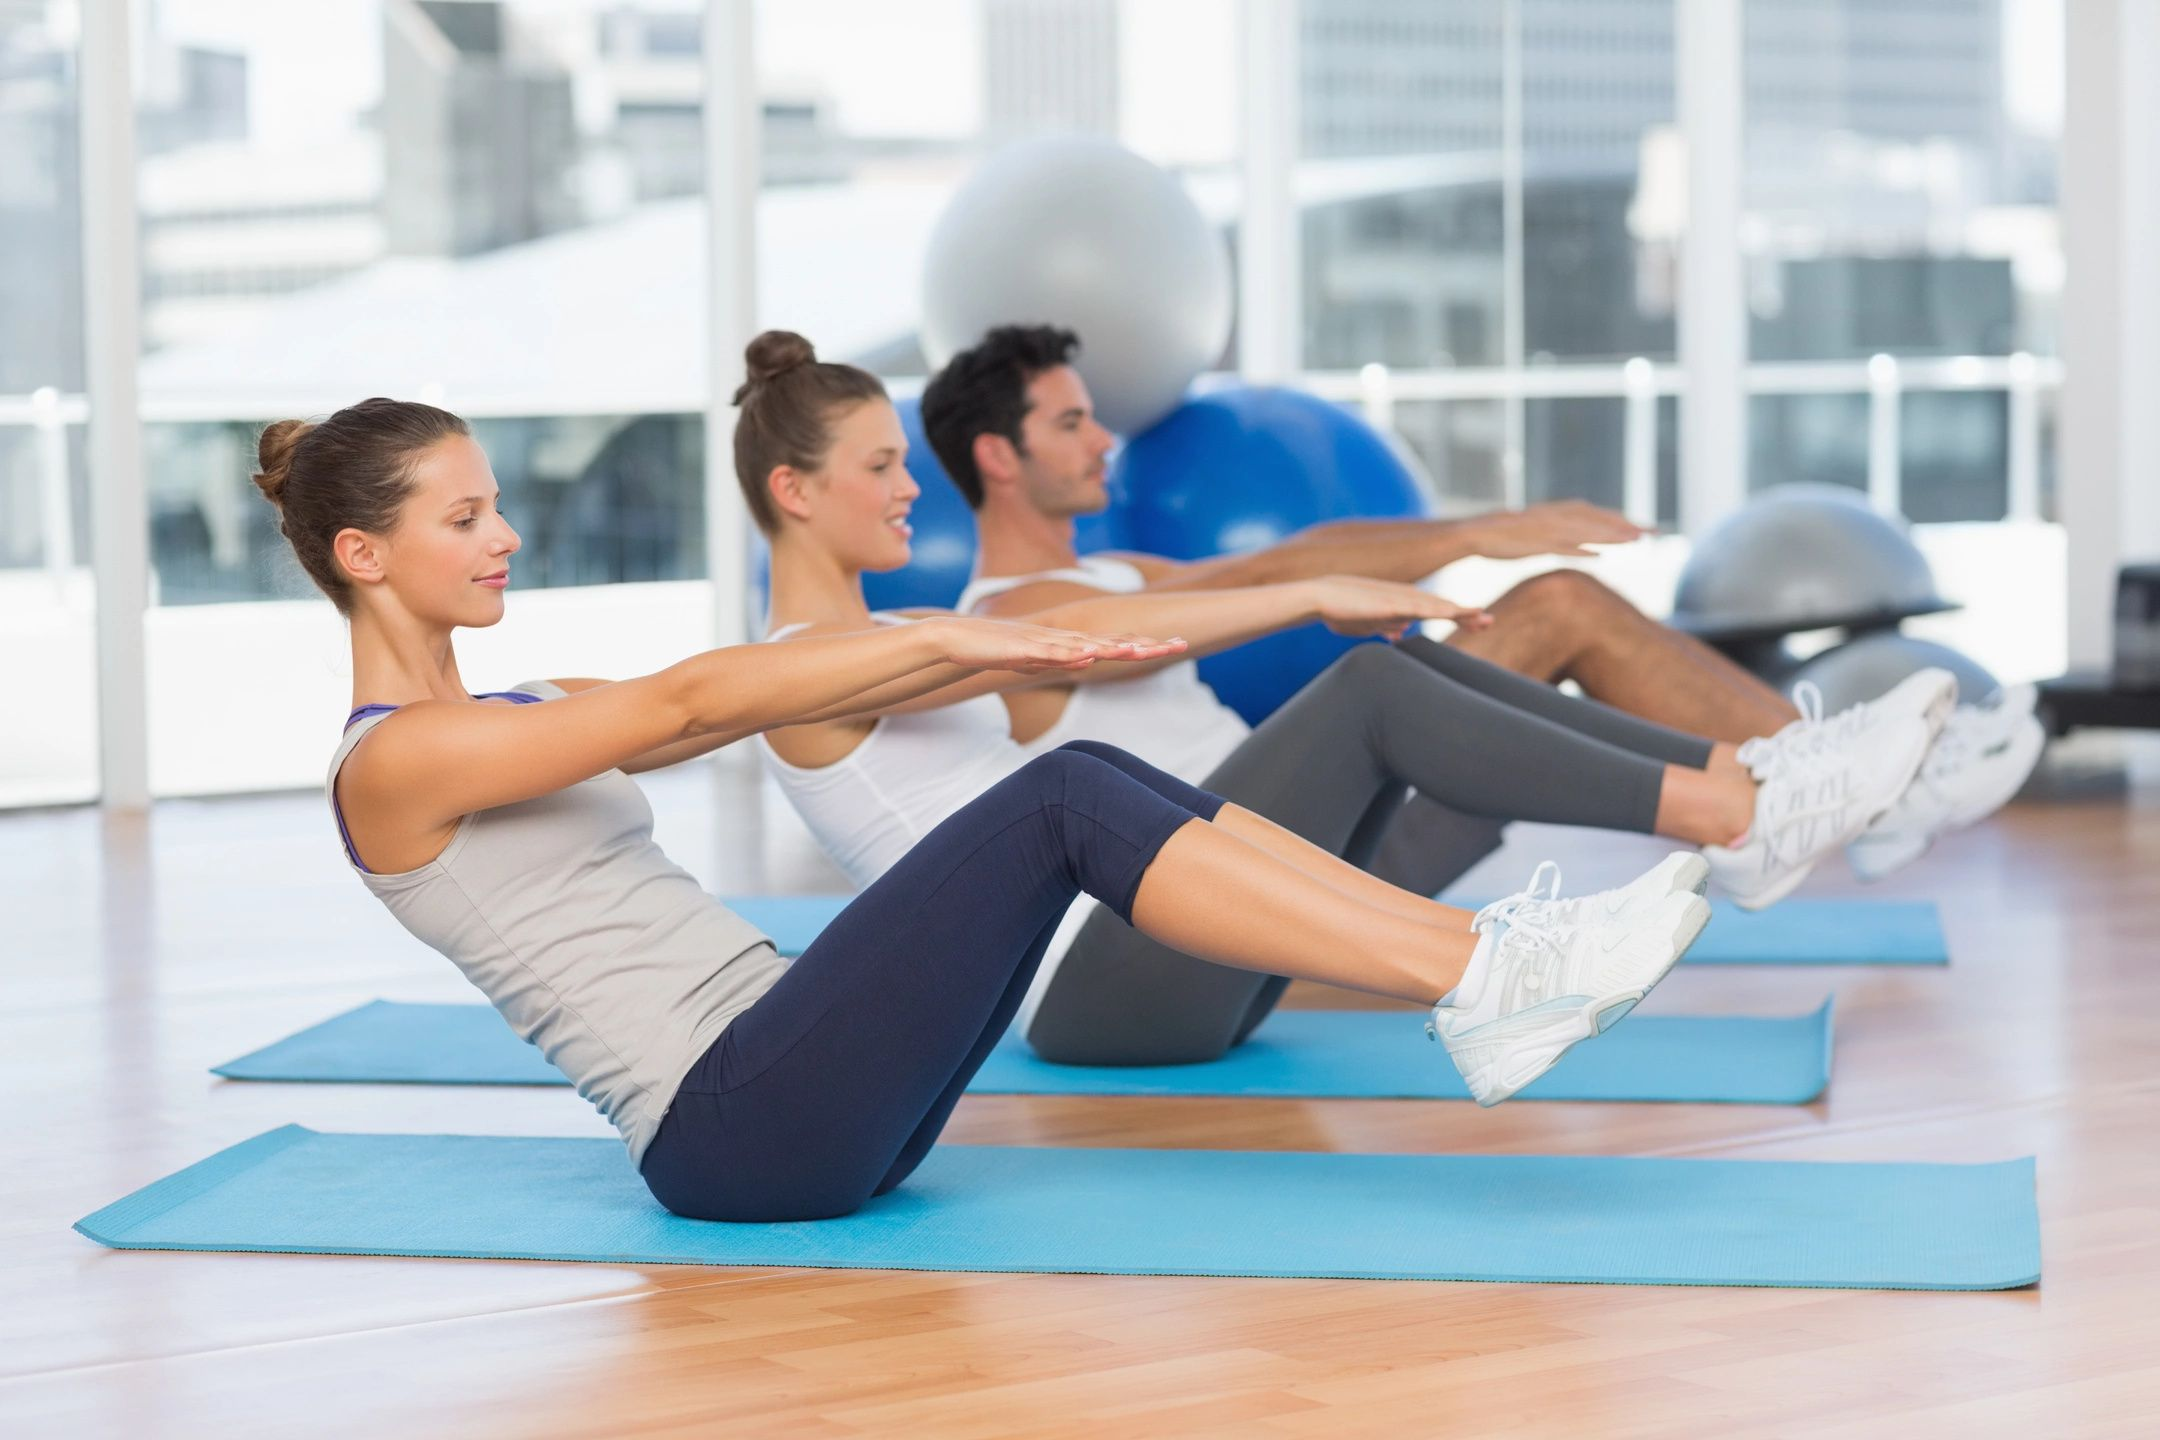 Partnered Strength Training